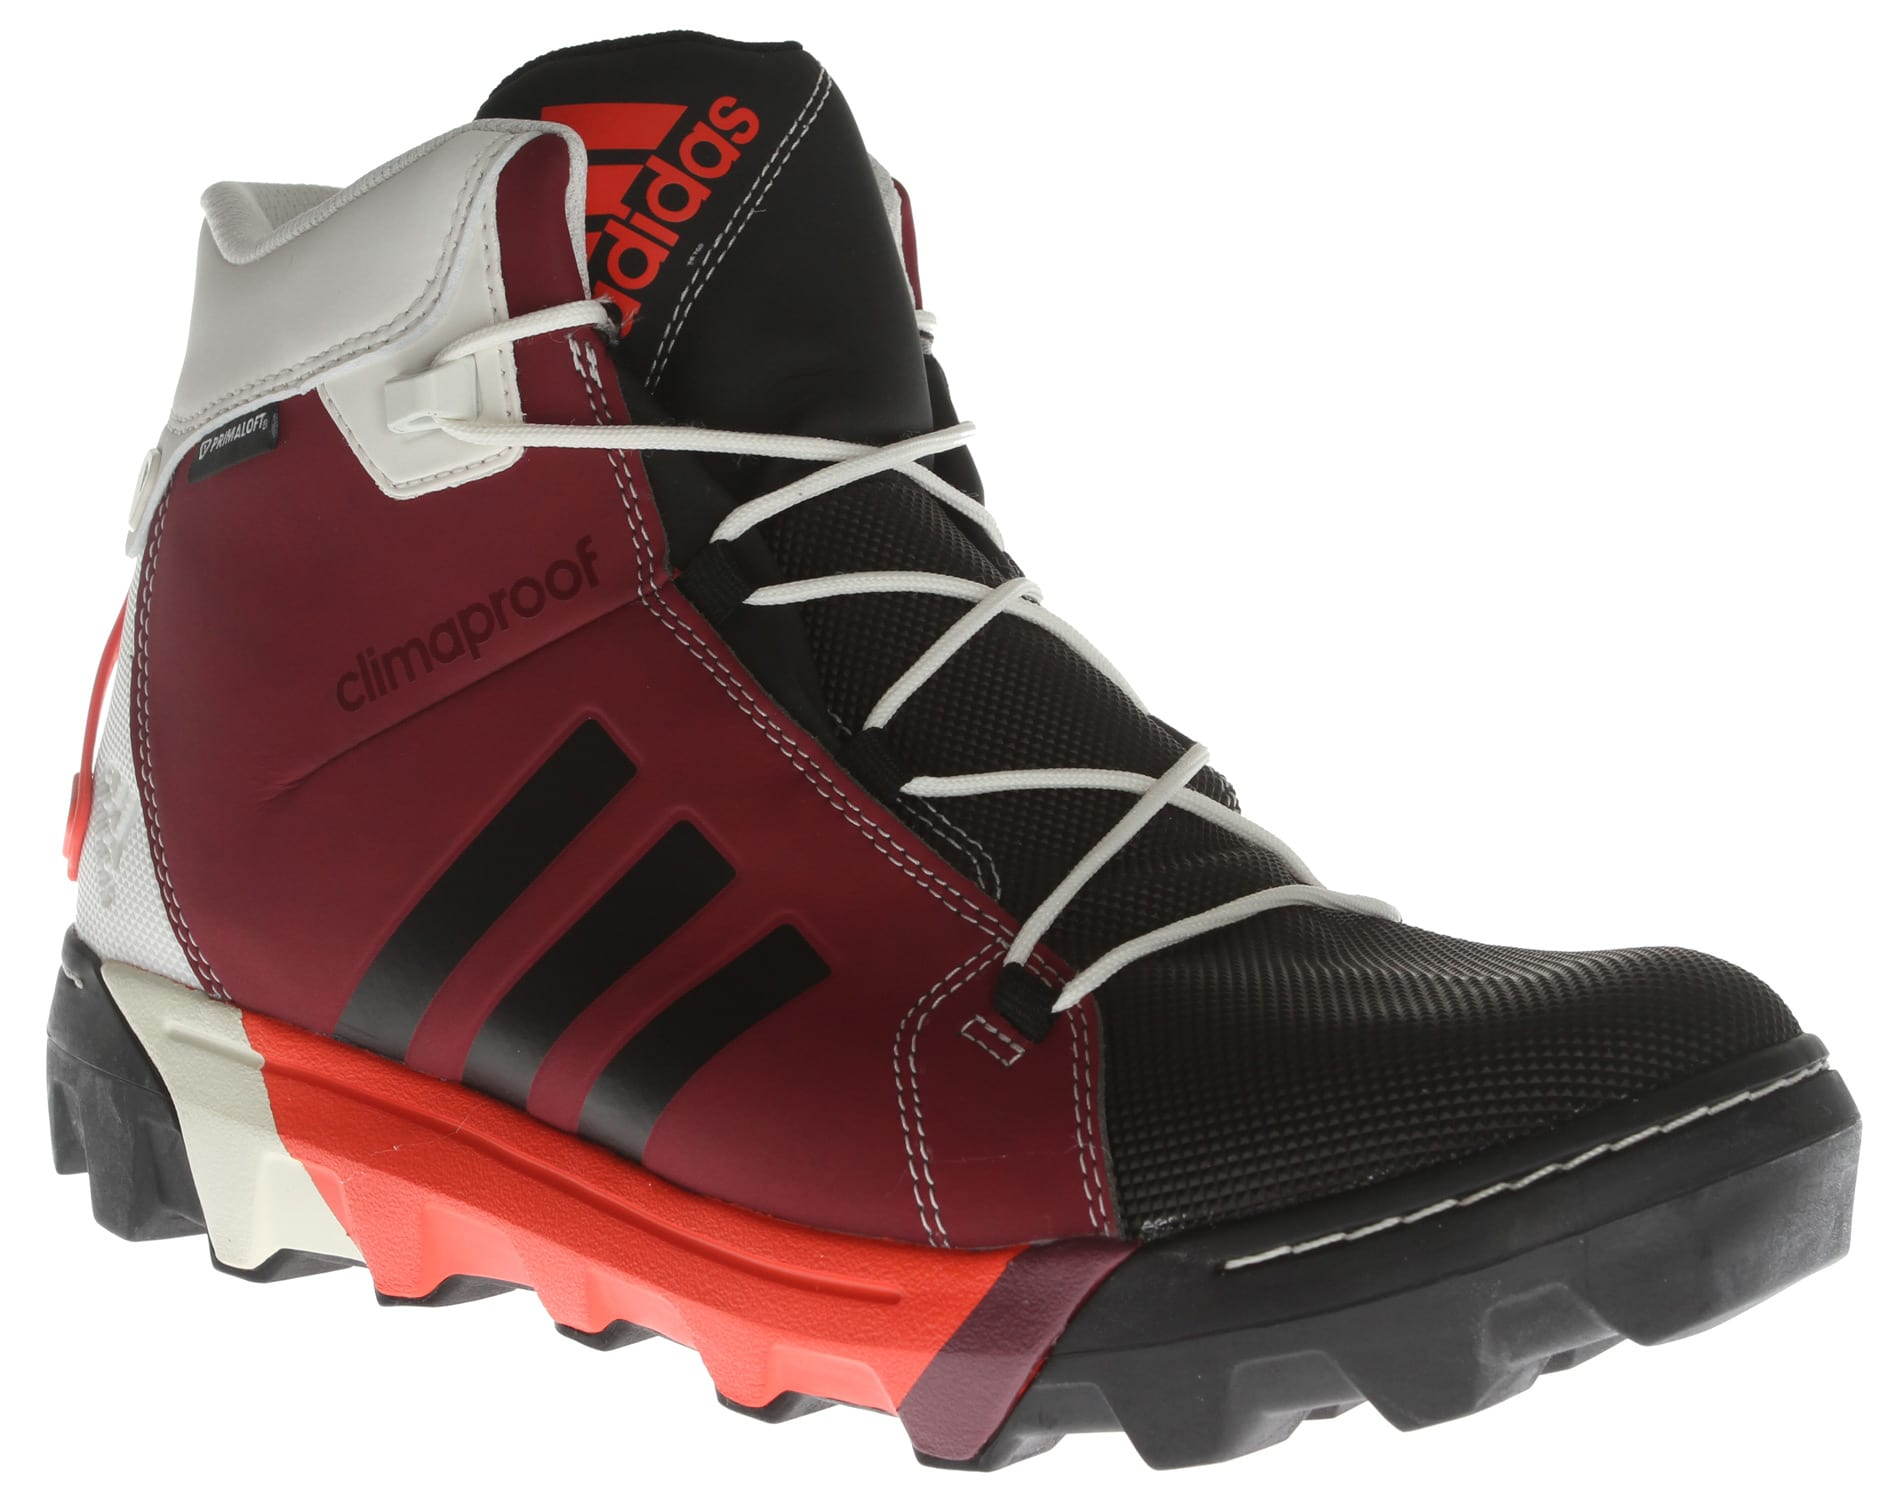 innovative design 17ba2 812cf Adidas Slopecruiser CP Primaloft Hiking Boots - thumbnail 2